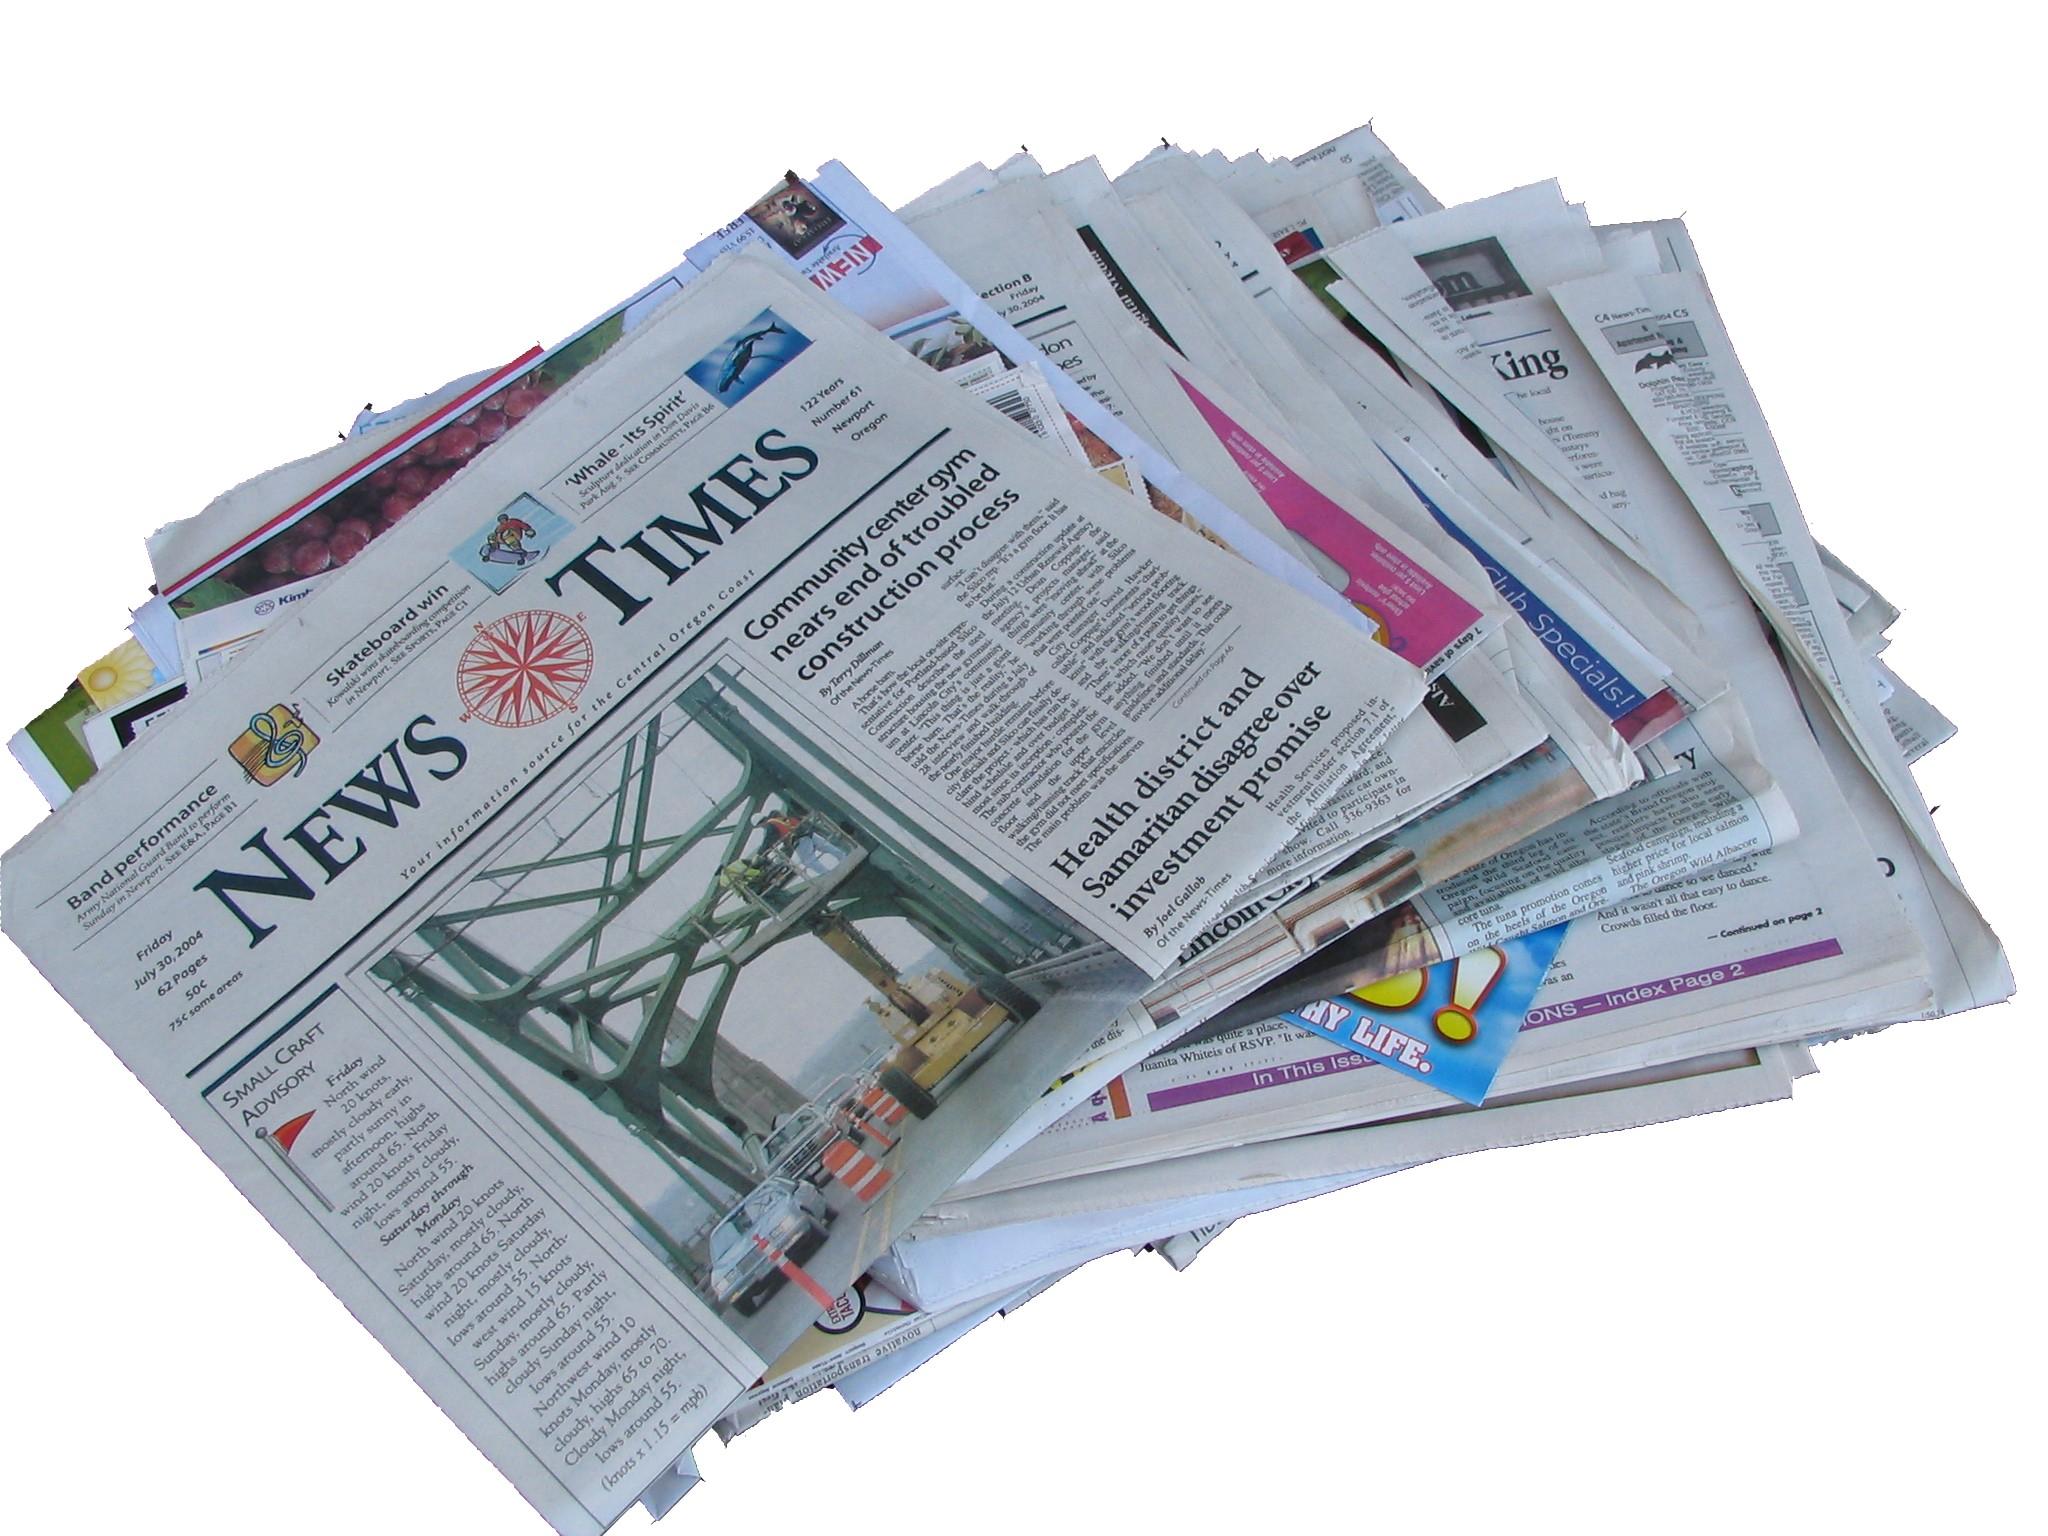 Development of newspaper magazines and books